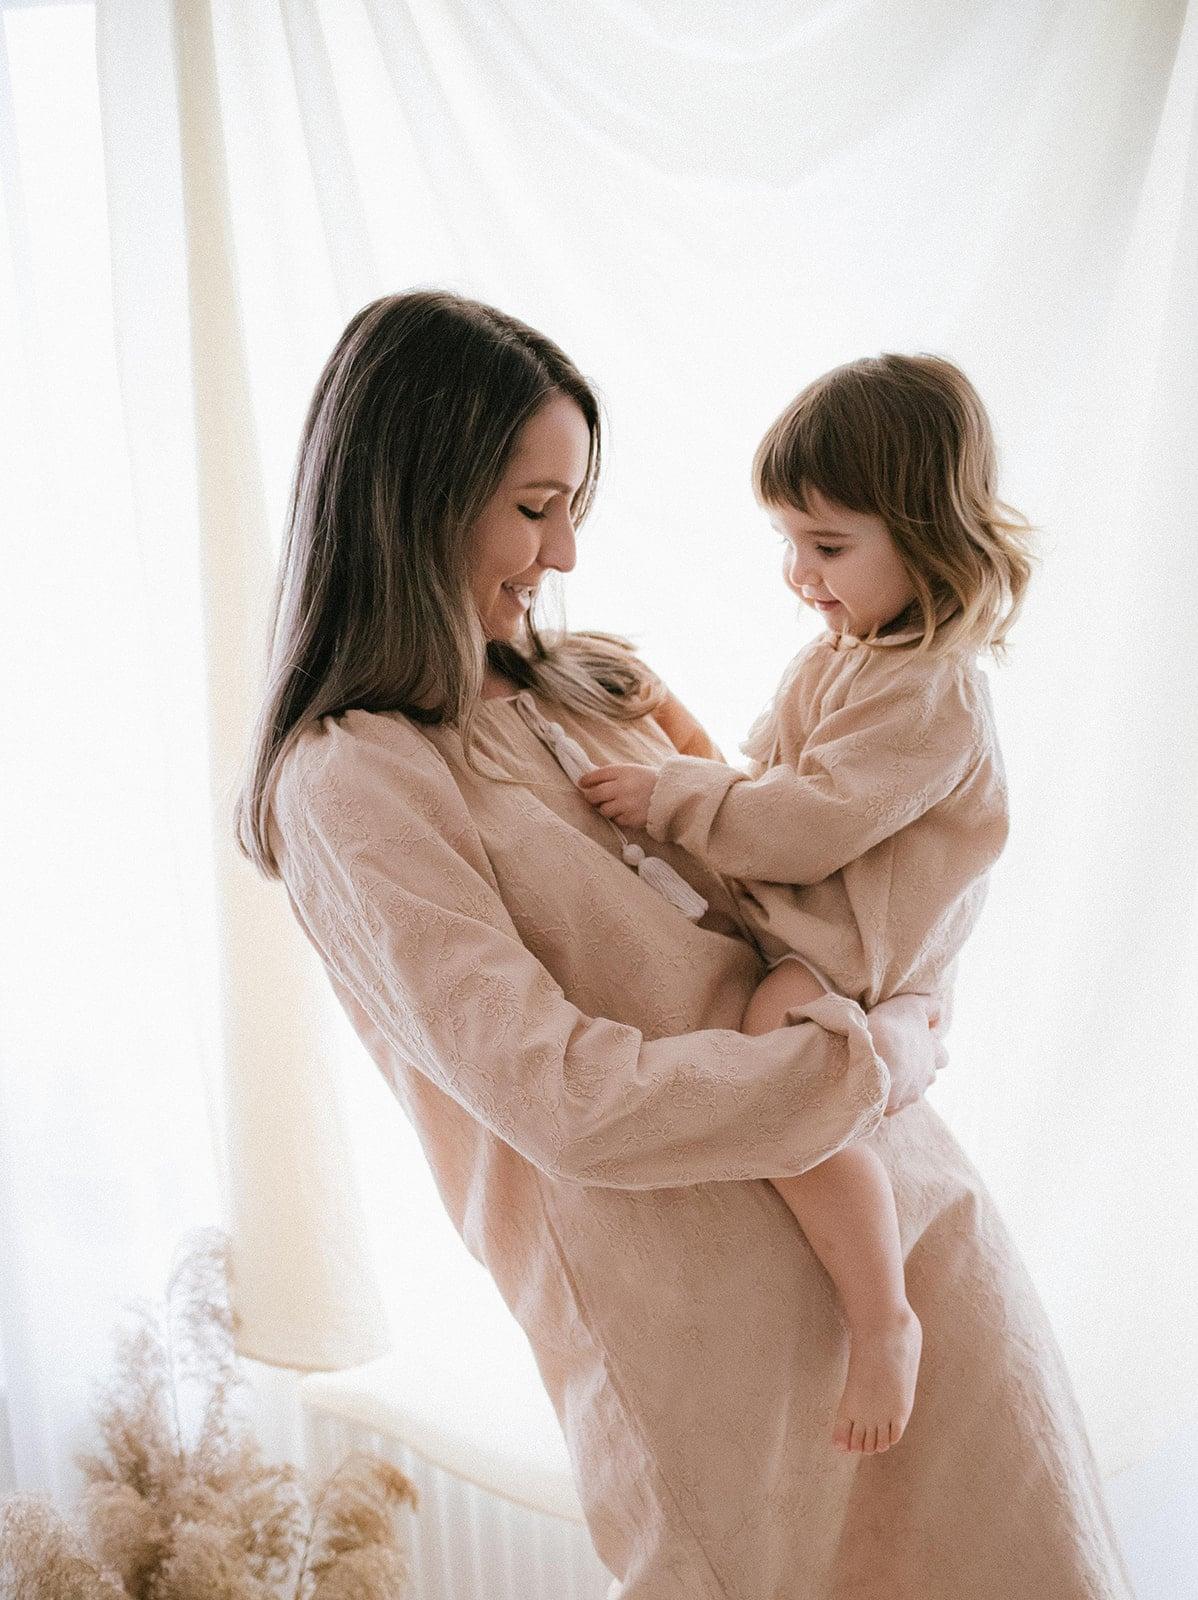 haine rochii bluze femei mame copii confortabile simple minimaliste naturale